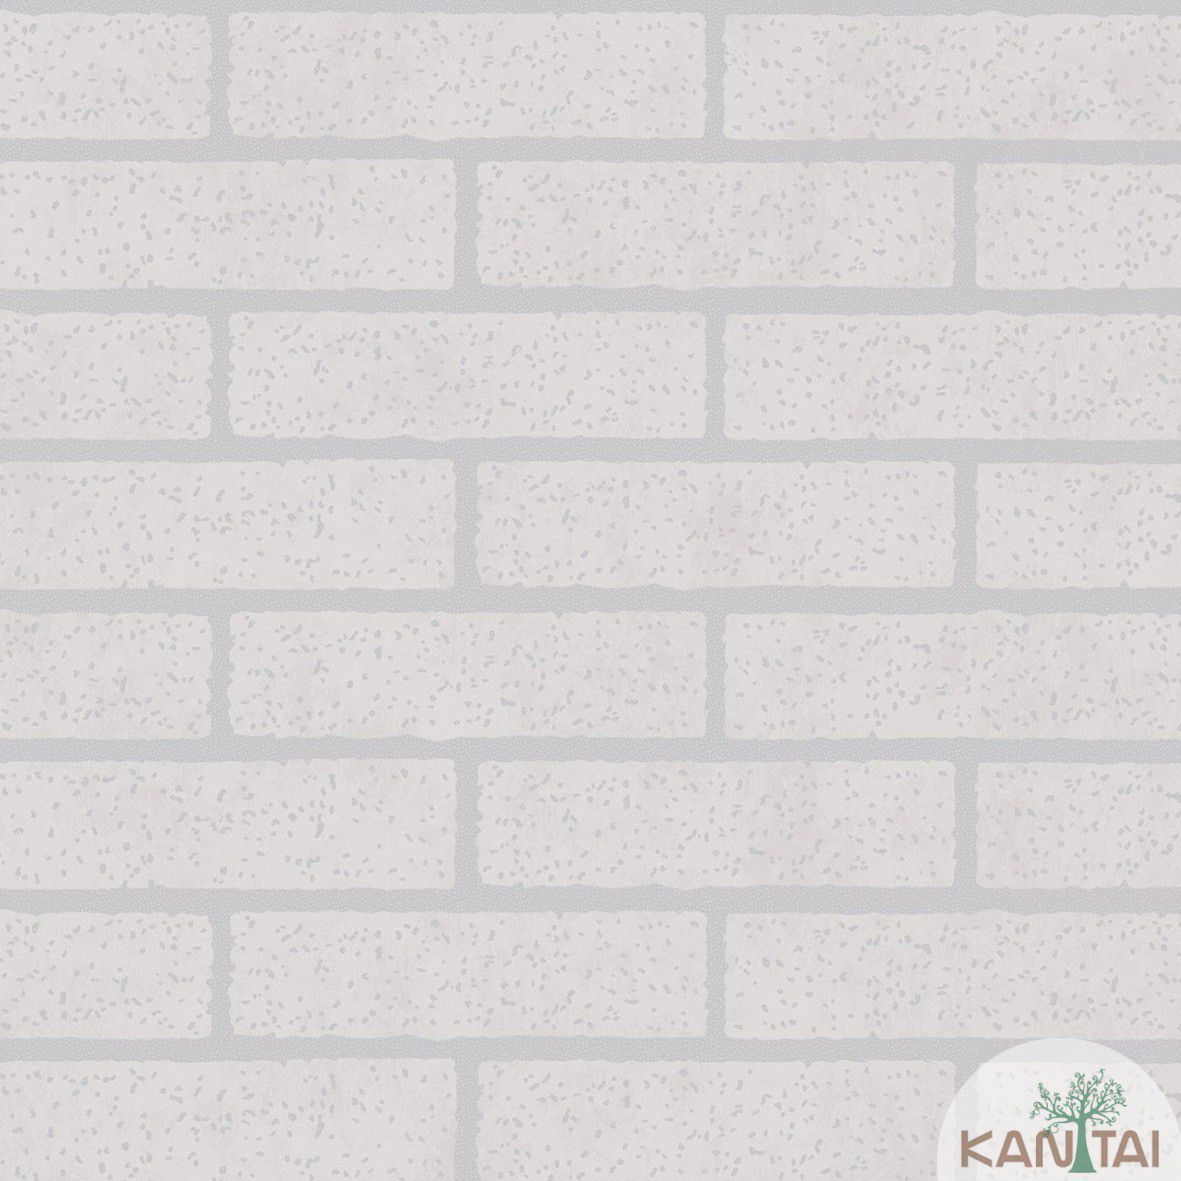 Papel de parede  Kan Tai Vinílico Coleção Style Tijolo Cinza Rejunte cinza